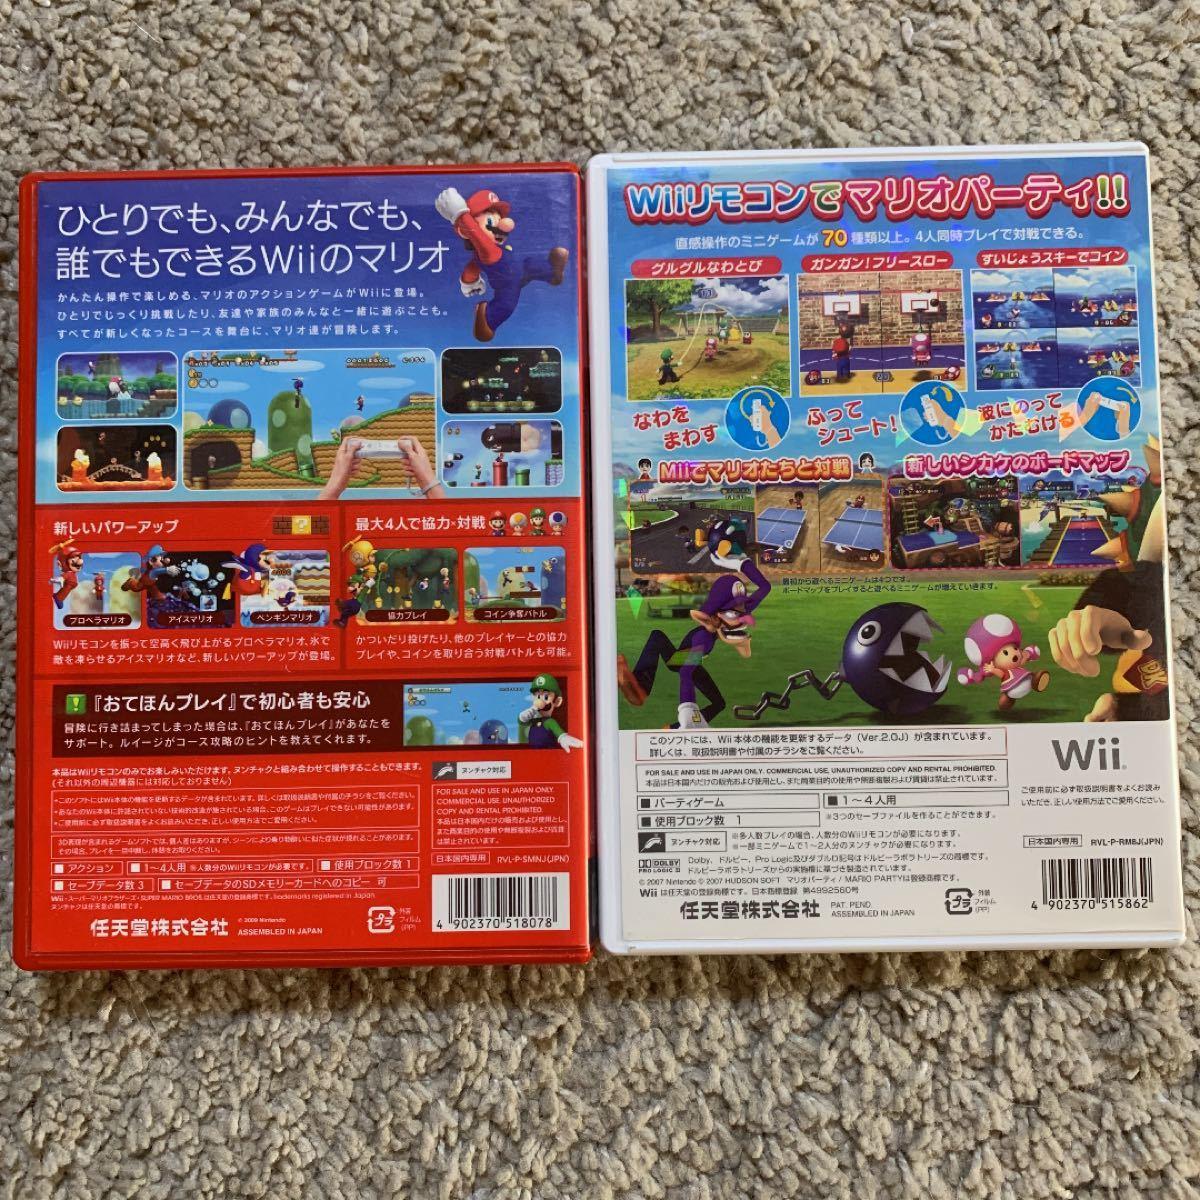 Wii NewスーパーマリオブラザーズWii マリオパーティ セット